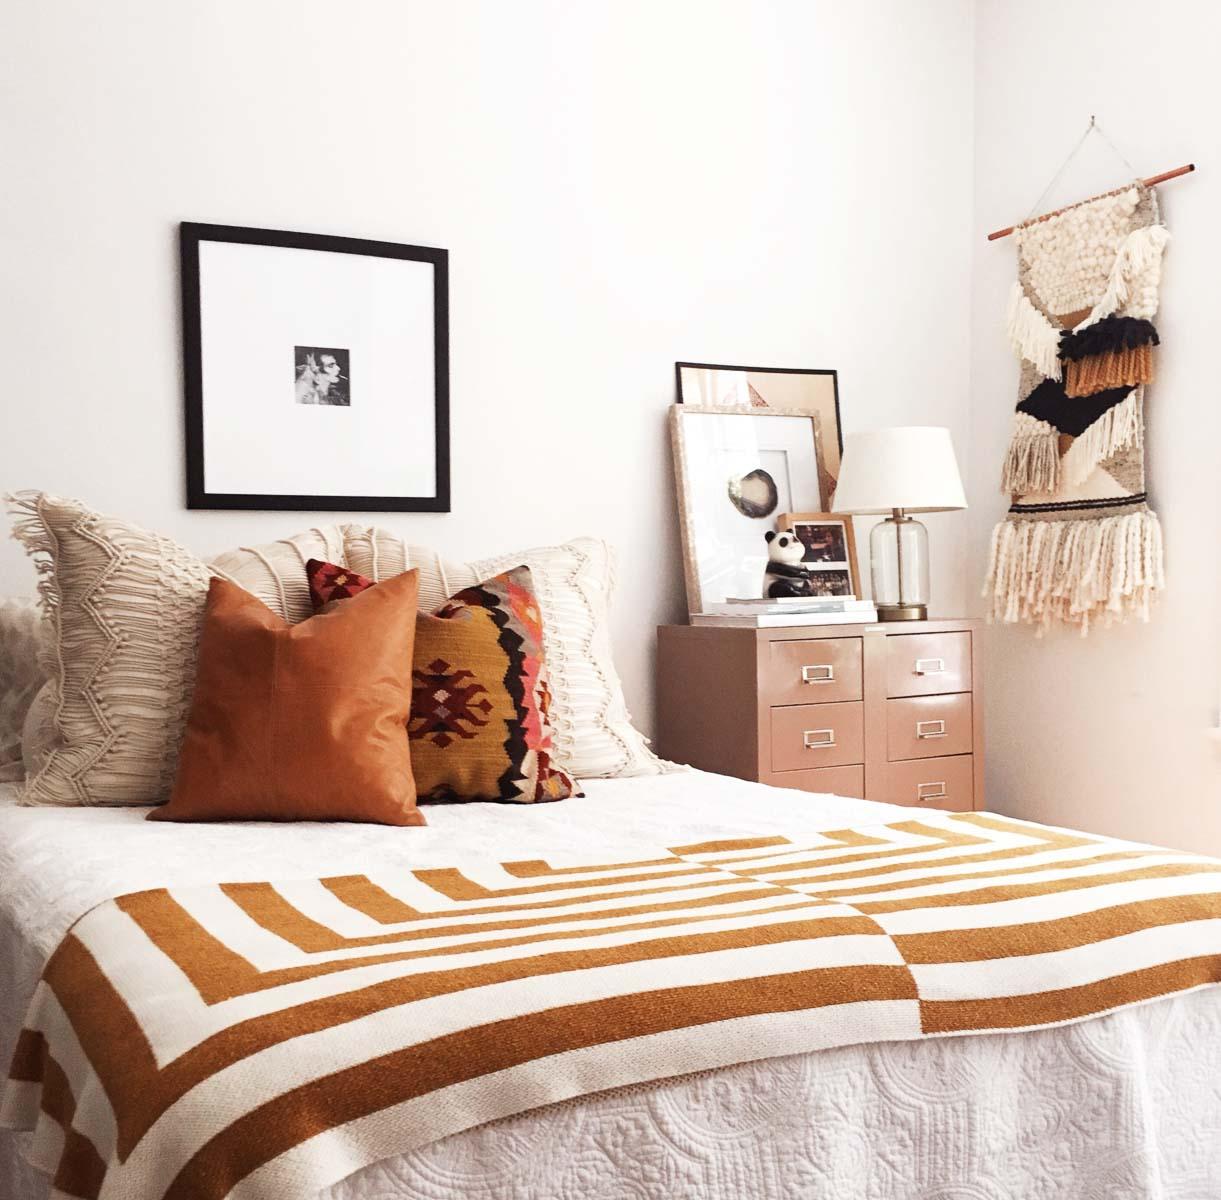 Boho-Charm-michigan-natural-light-photography-studio-lifestyle-photo-ideas-indoor-photoshoot-location-14.jpg